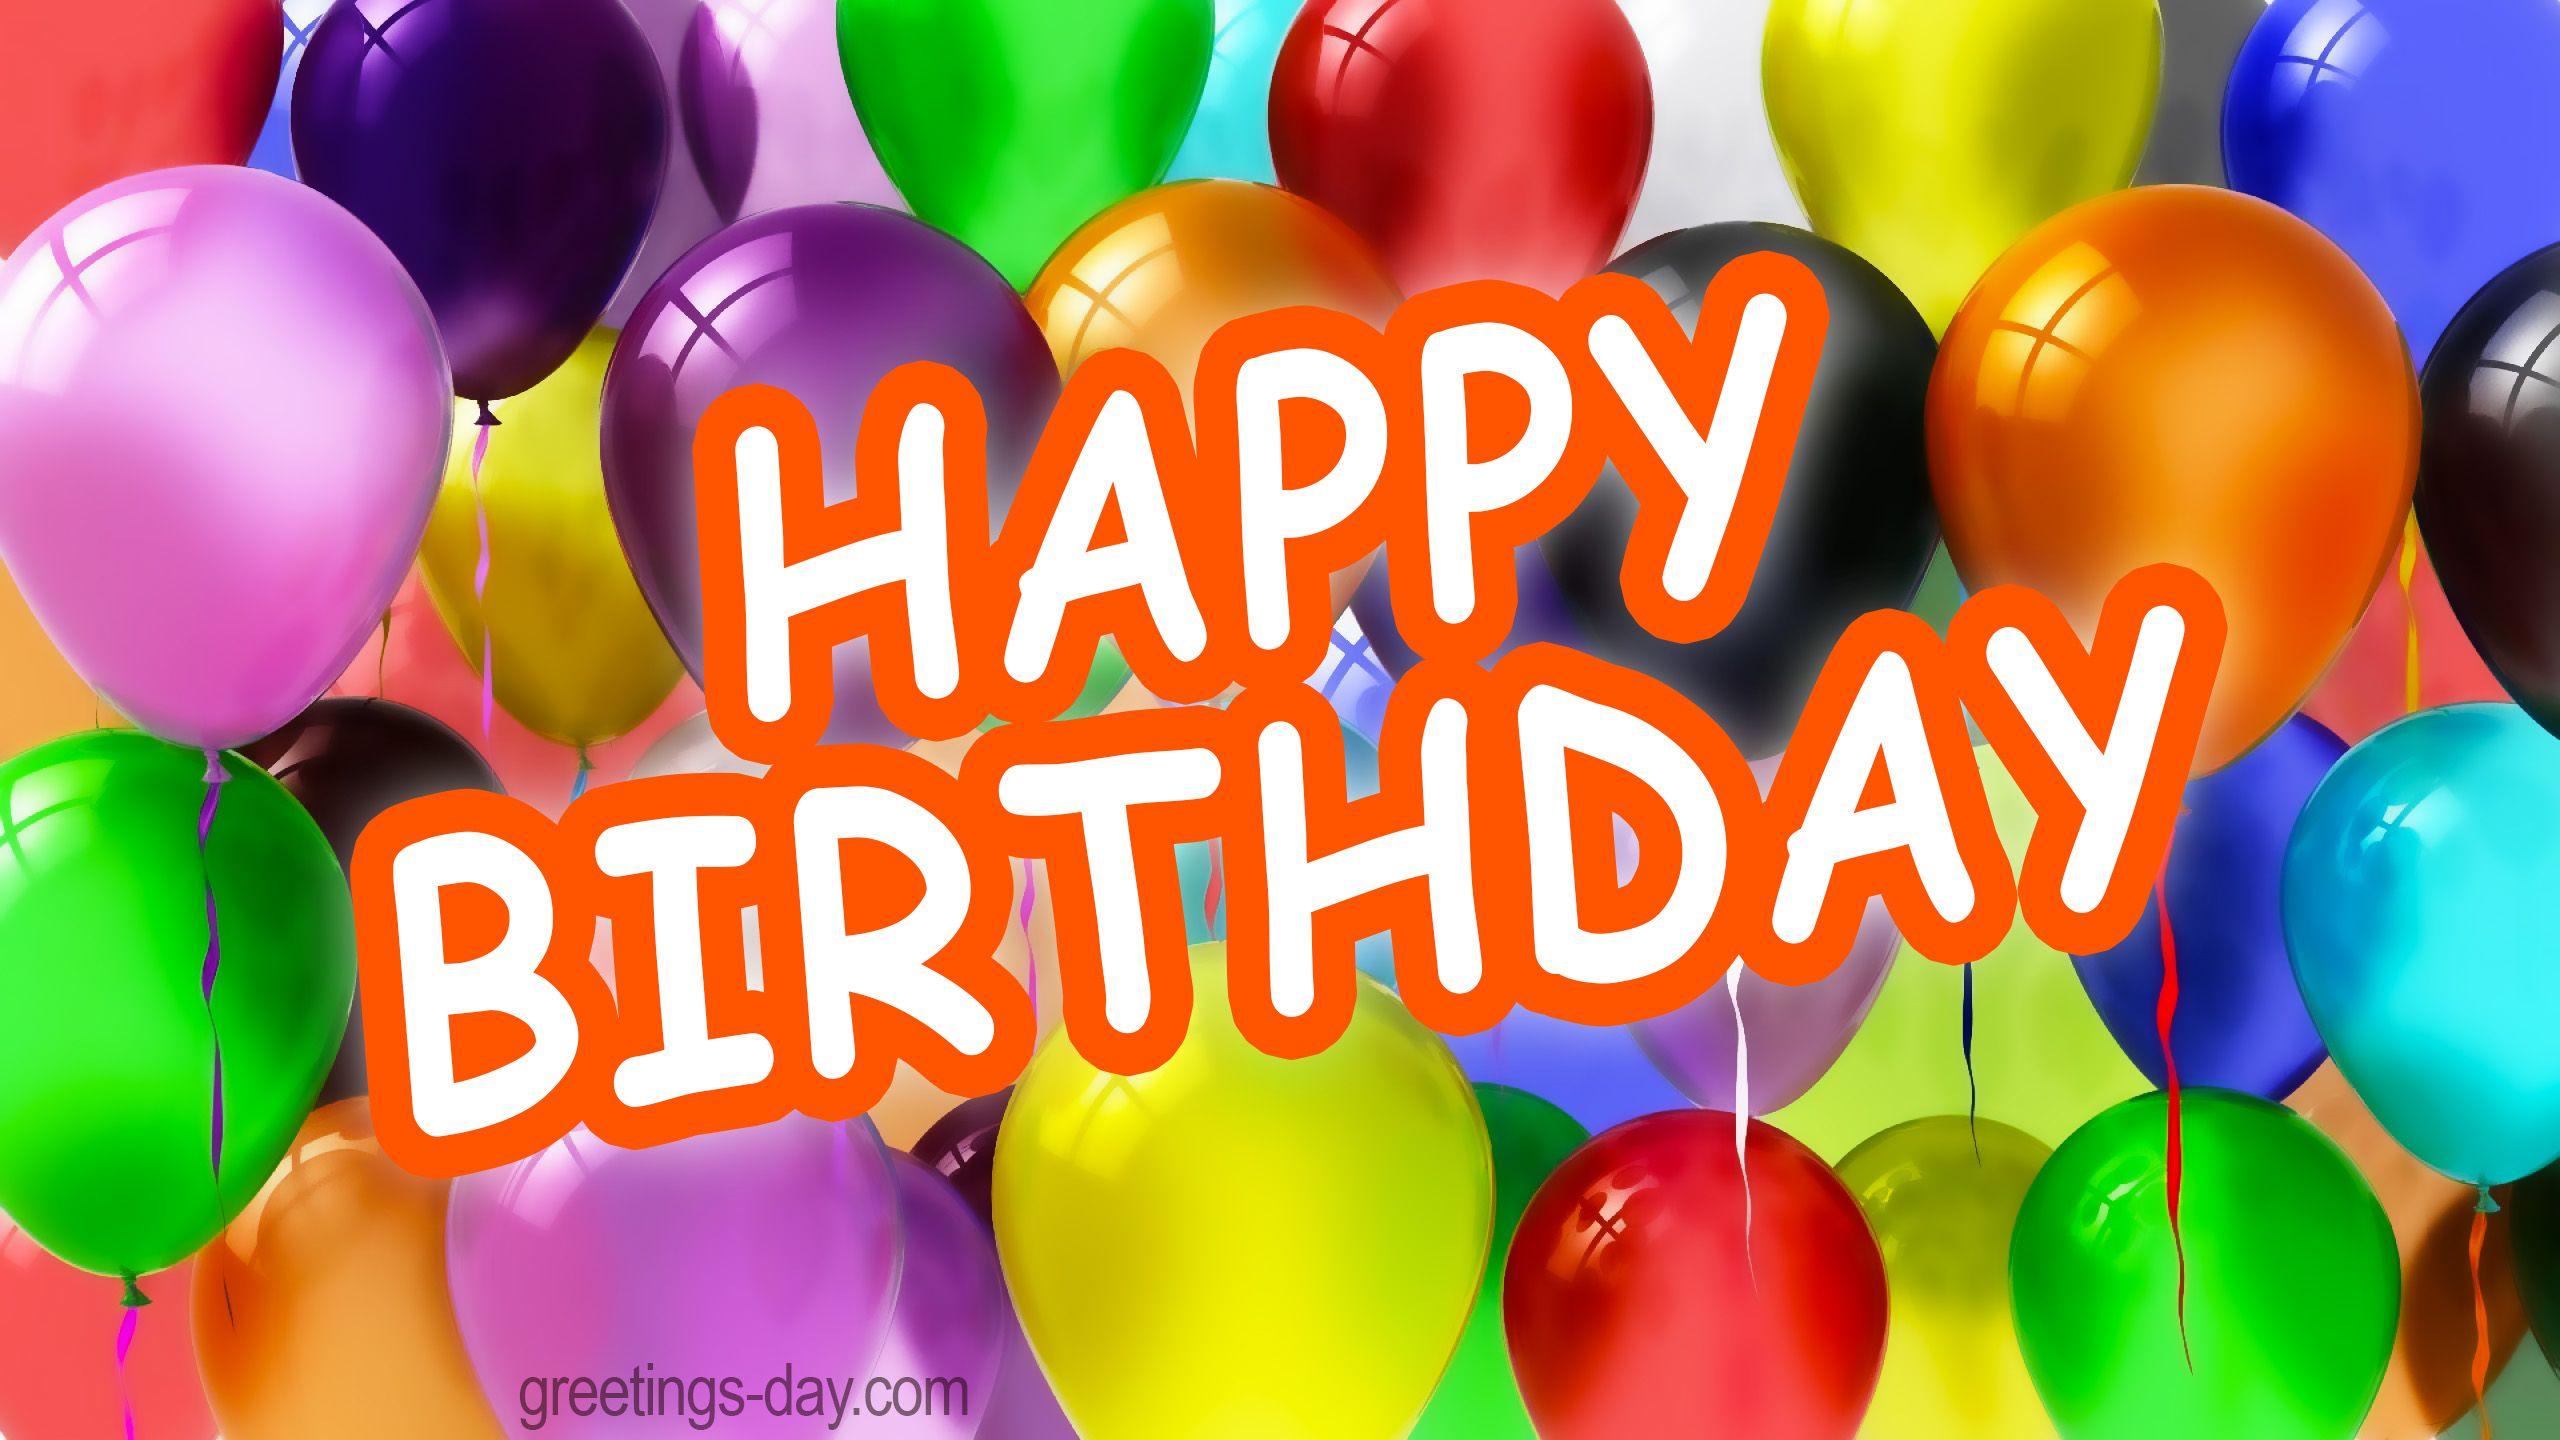 Happy BirthdayEcards Wishes and Greetings Birthday